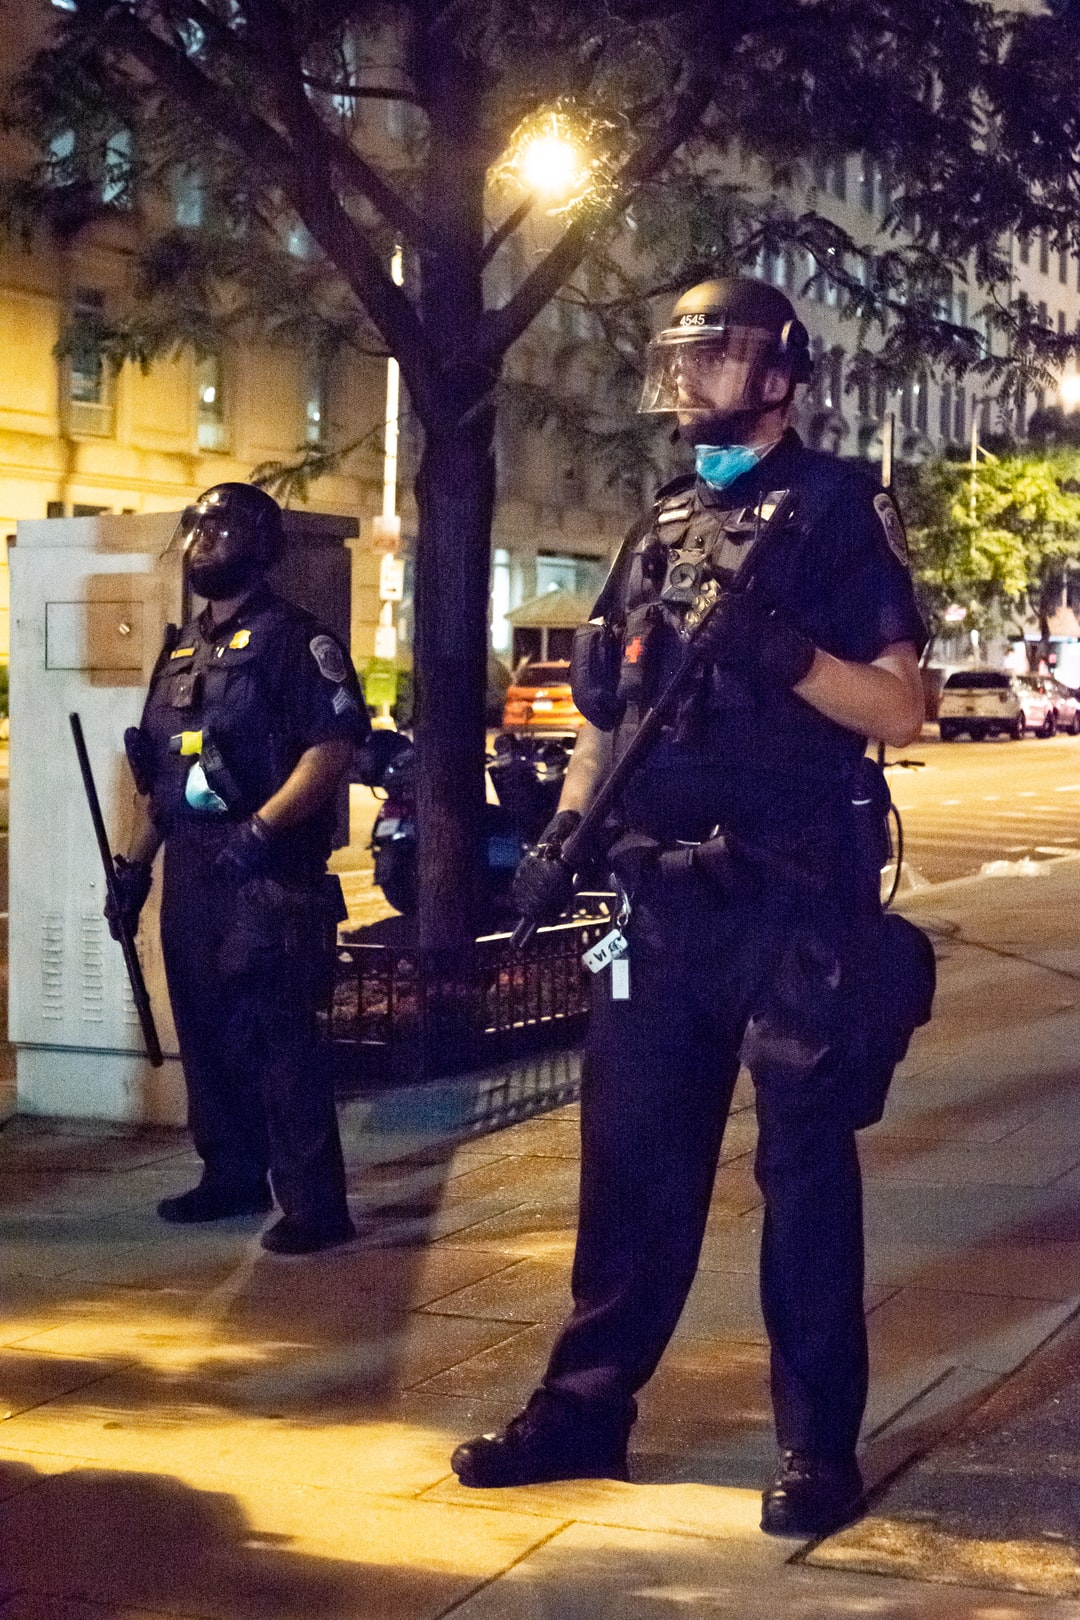 Policeman blocking protestors